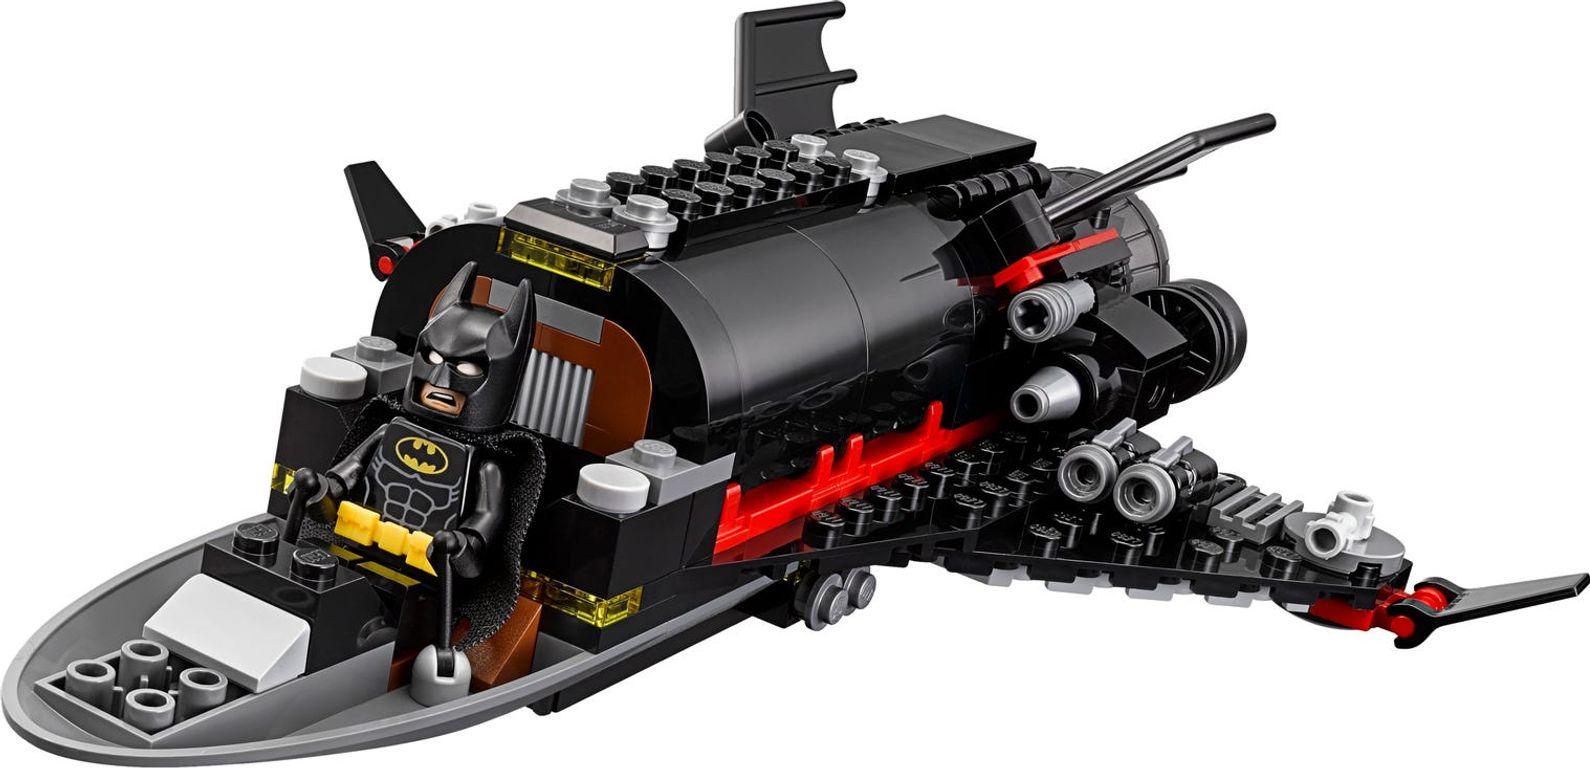 LEGO® Batman Movie The Bat-Space Shuttle interior